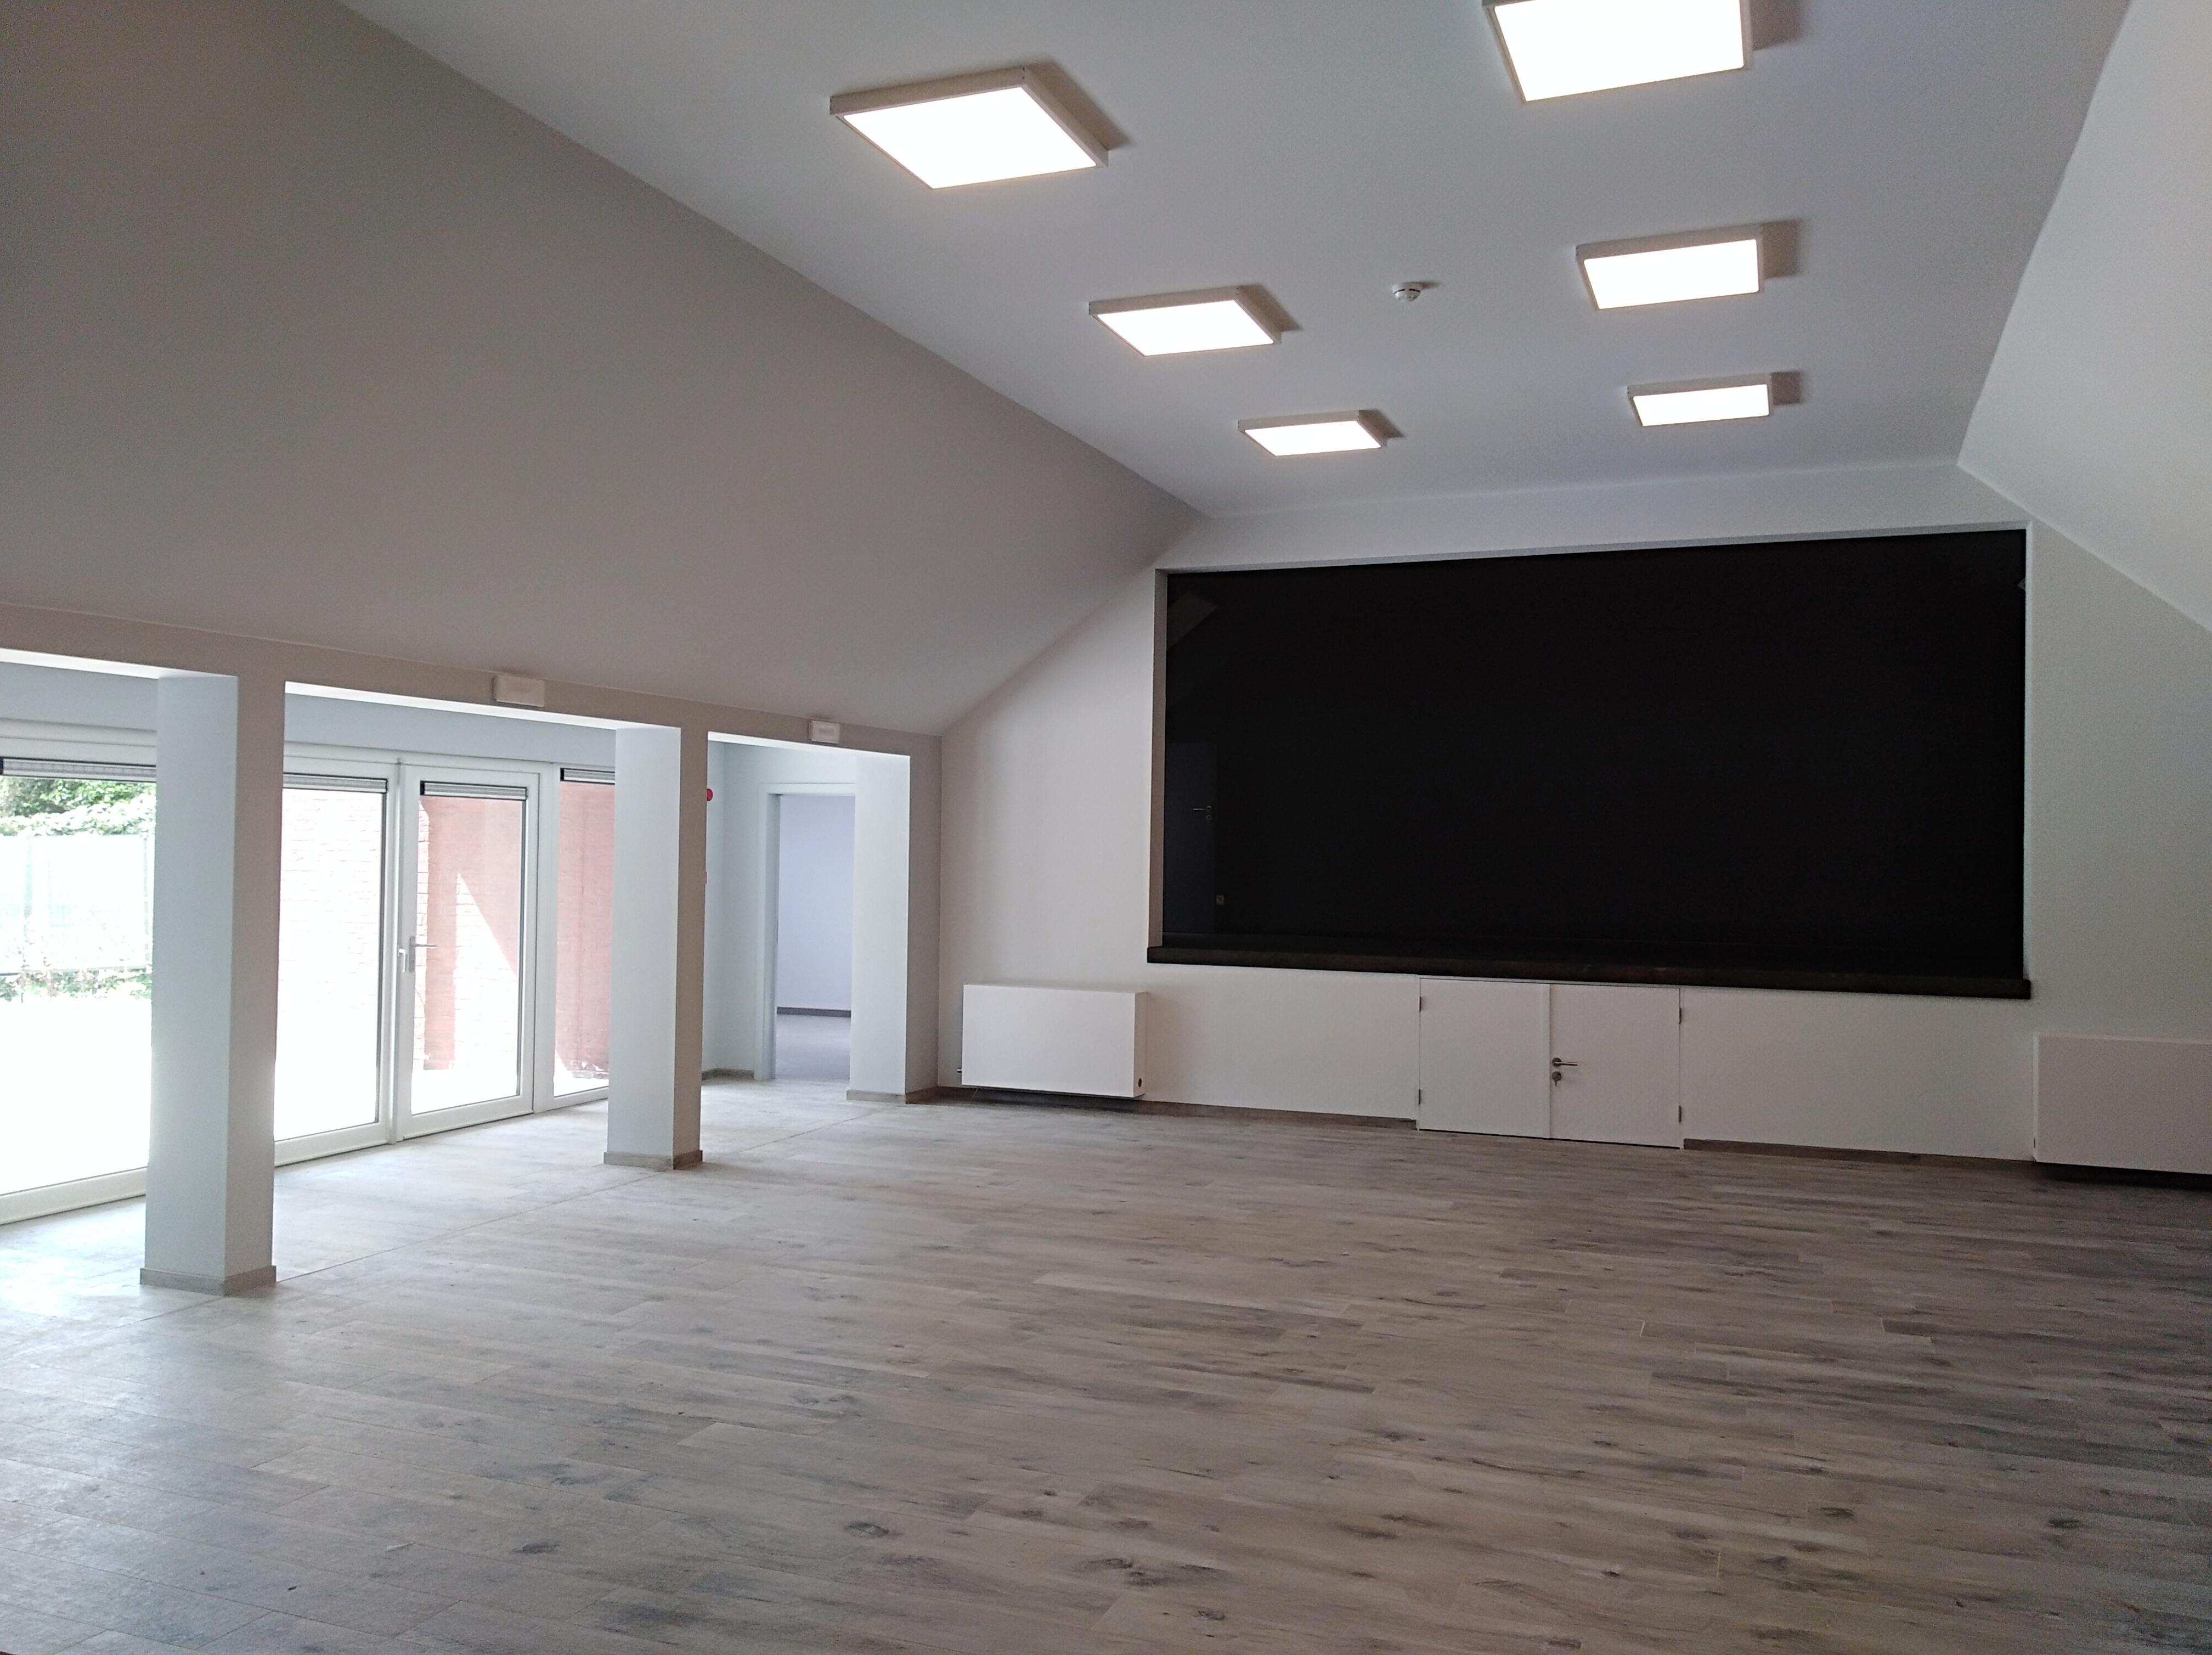 Salle des Loisirs de Soiron